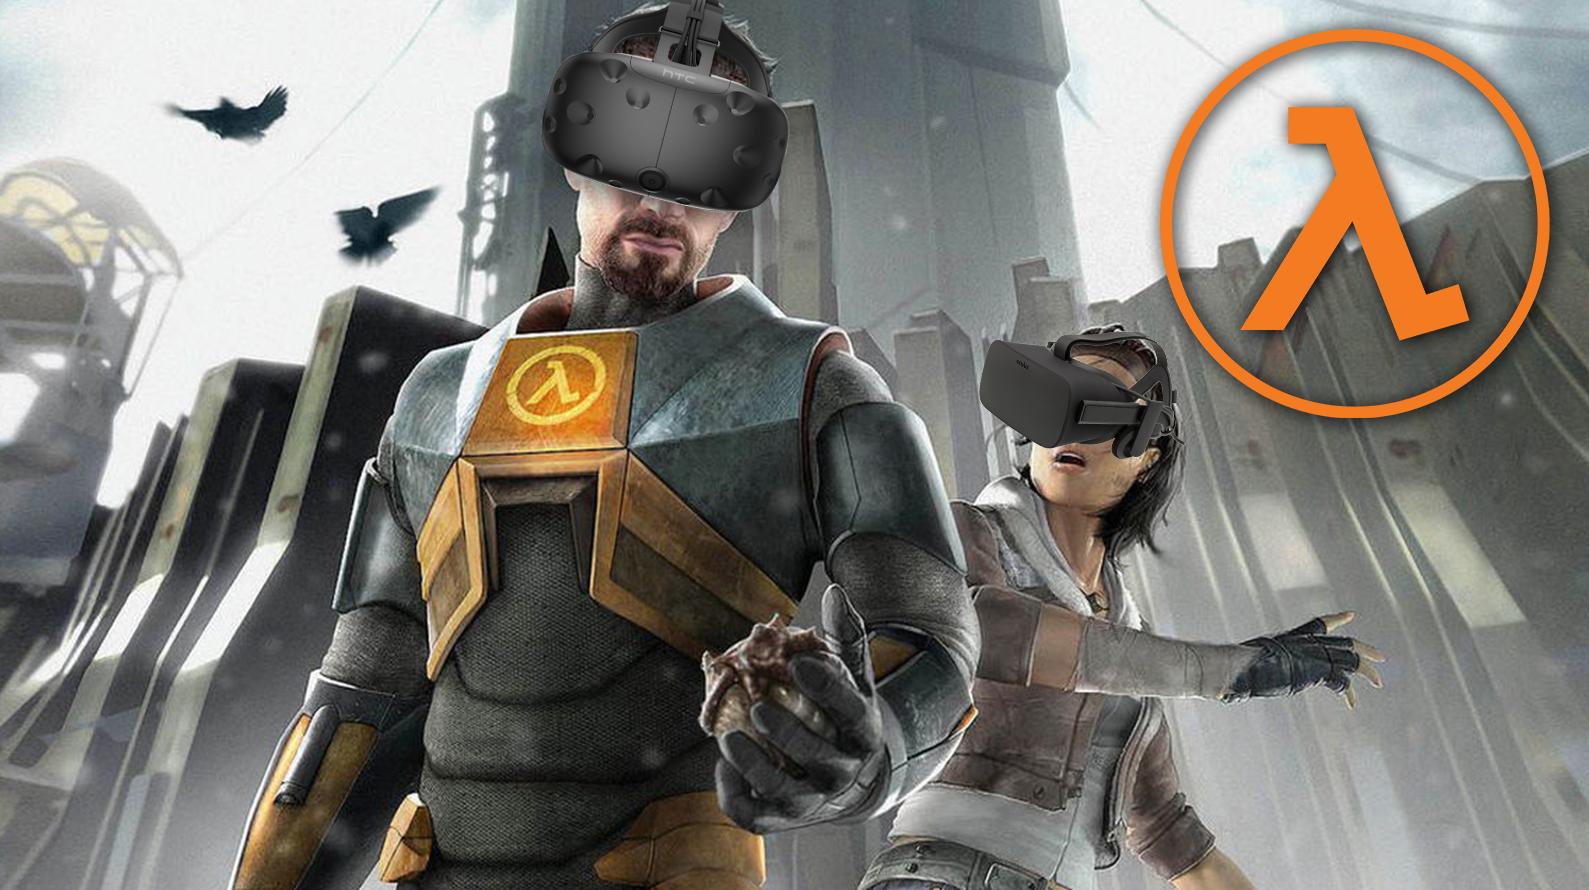 Valve Corporation - Half-Life